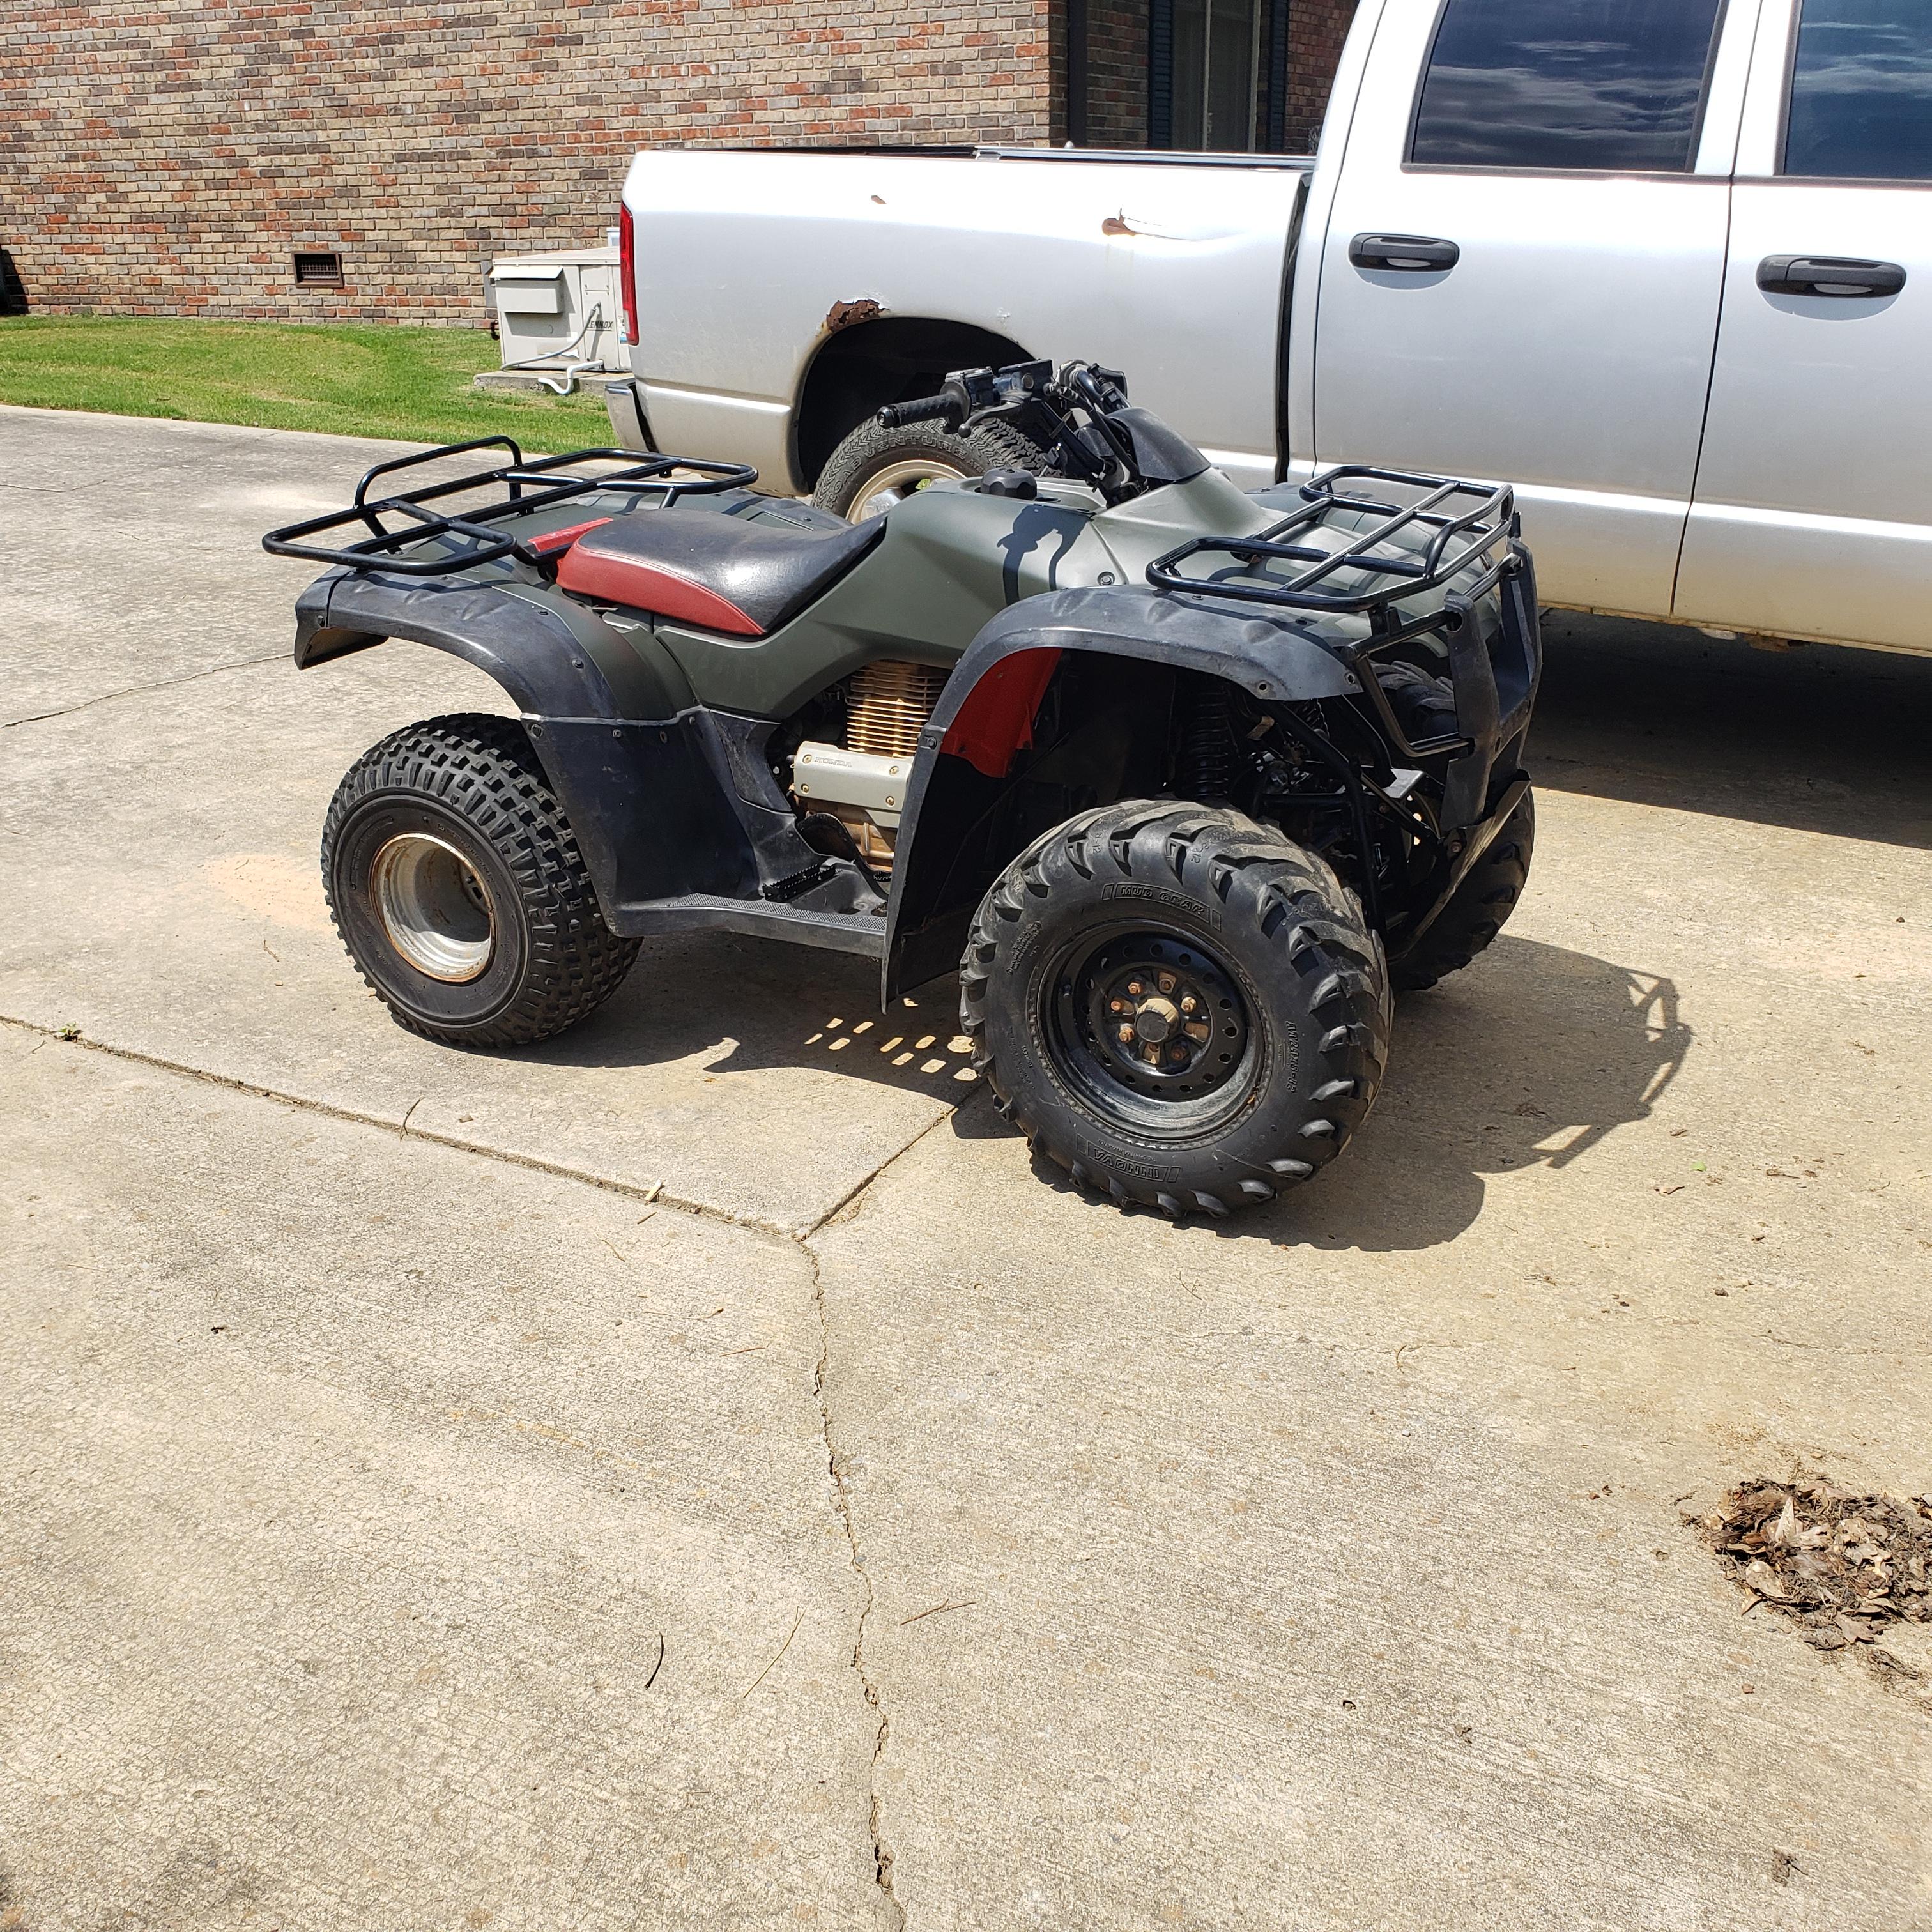 2005 Honda rancher 350 4x4 front drive shaft help-20190508_141604_1557504985622.jpg